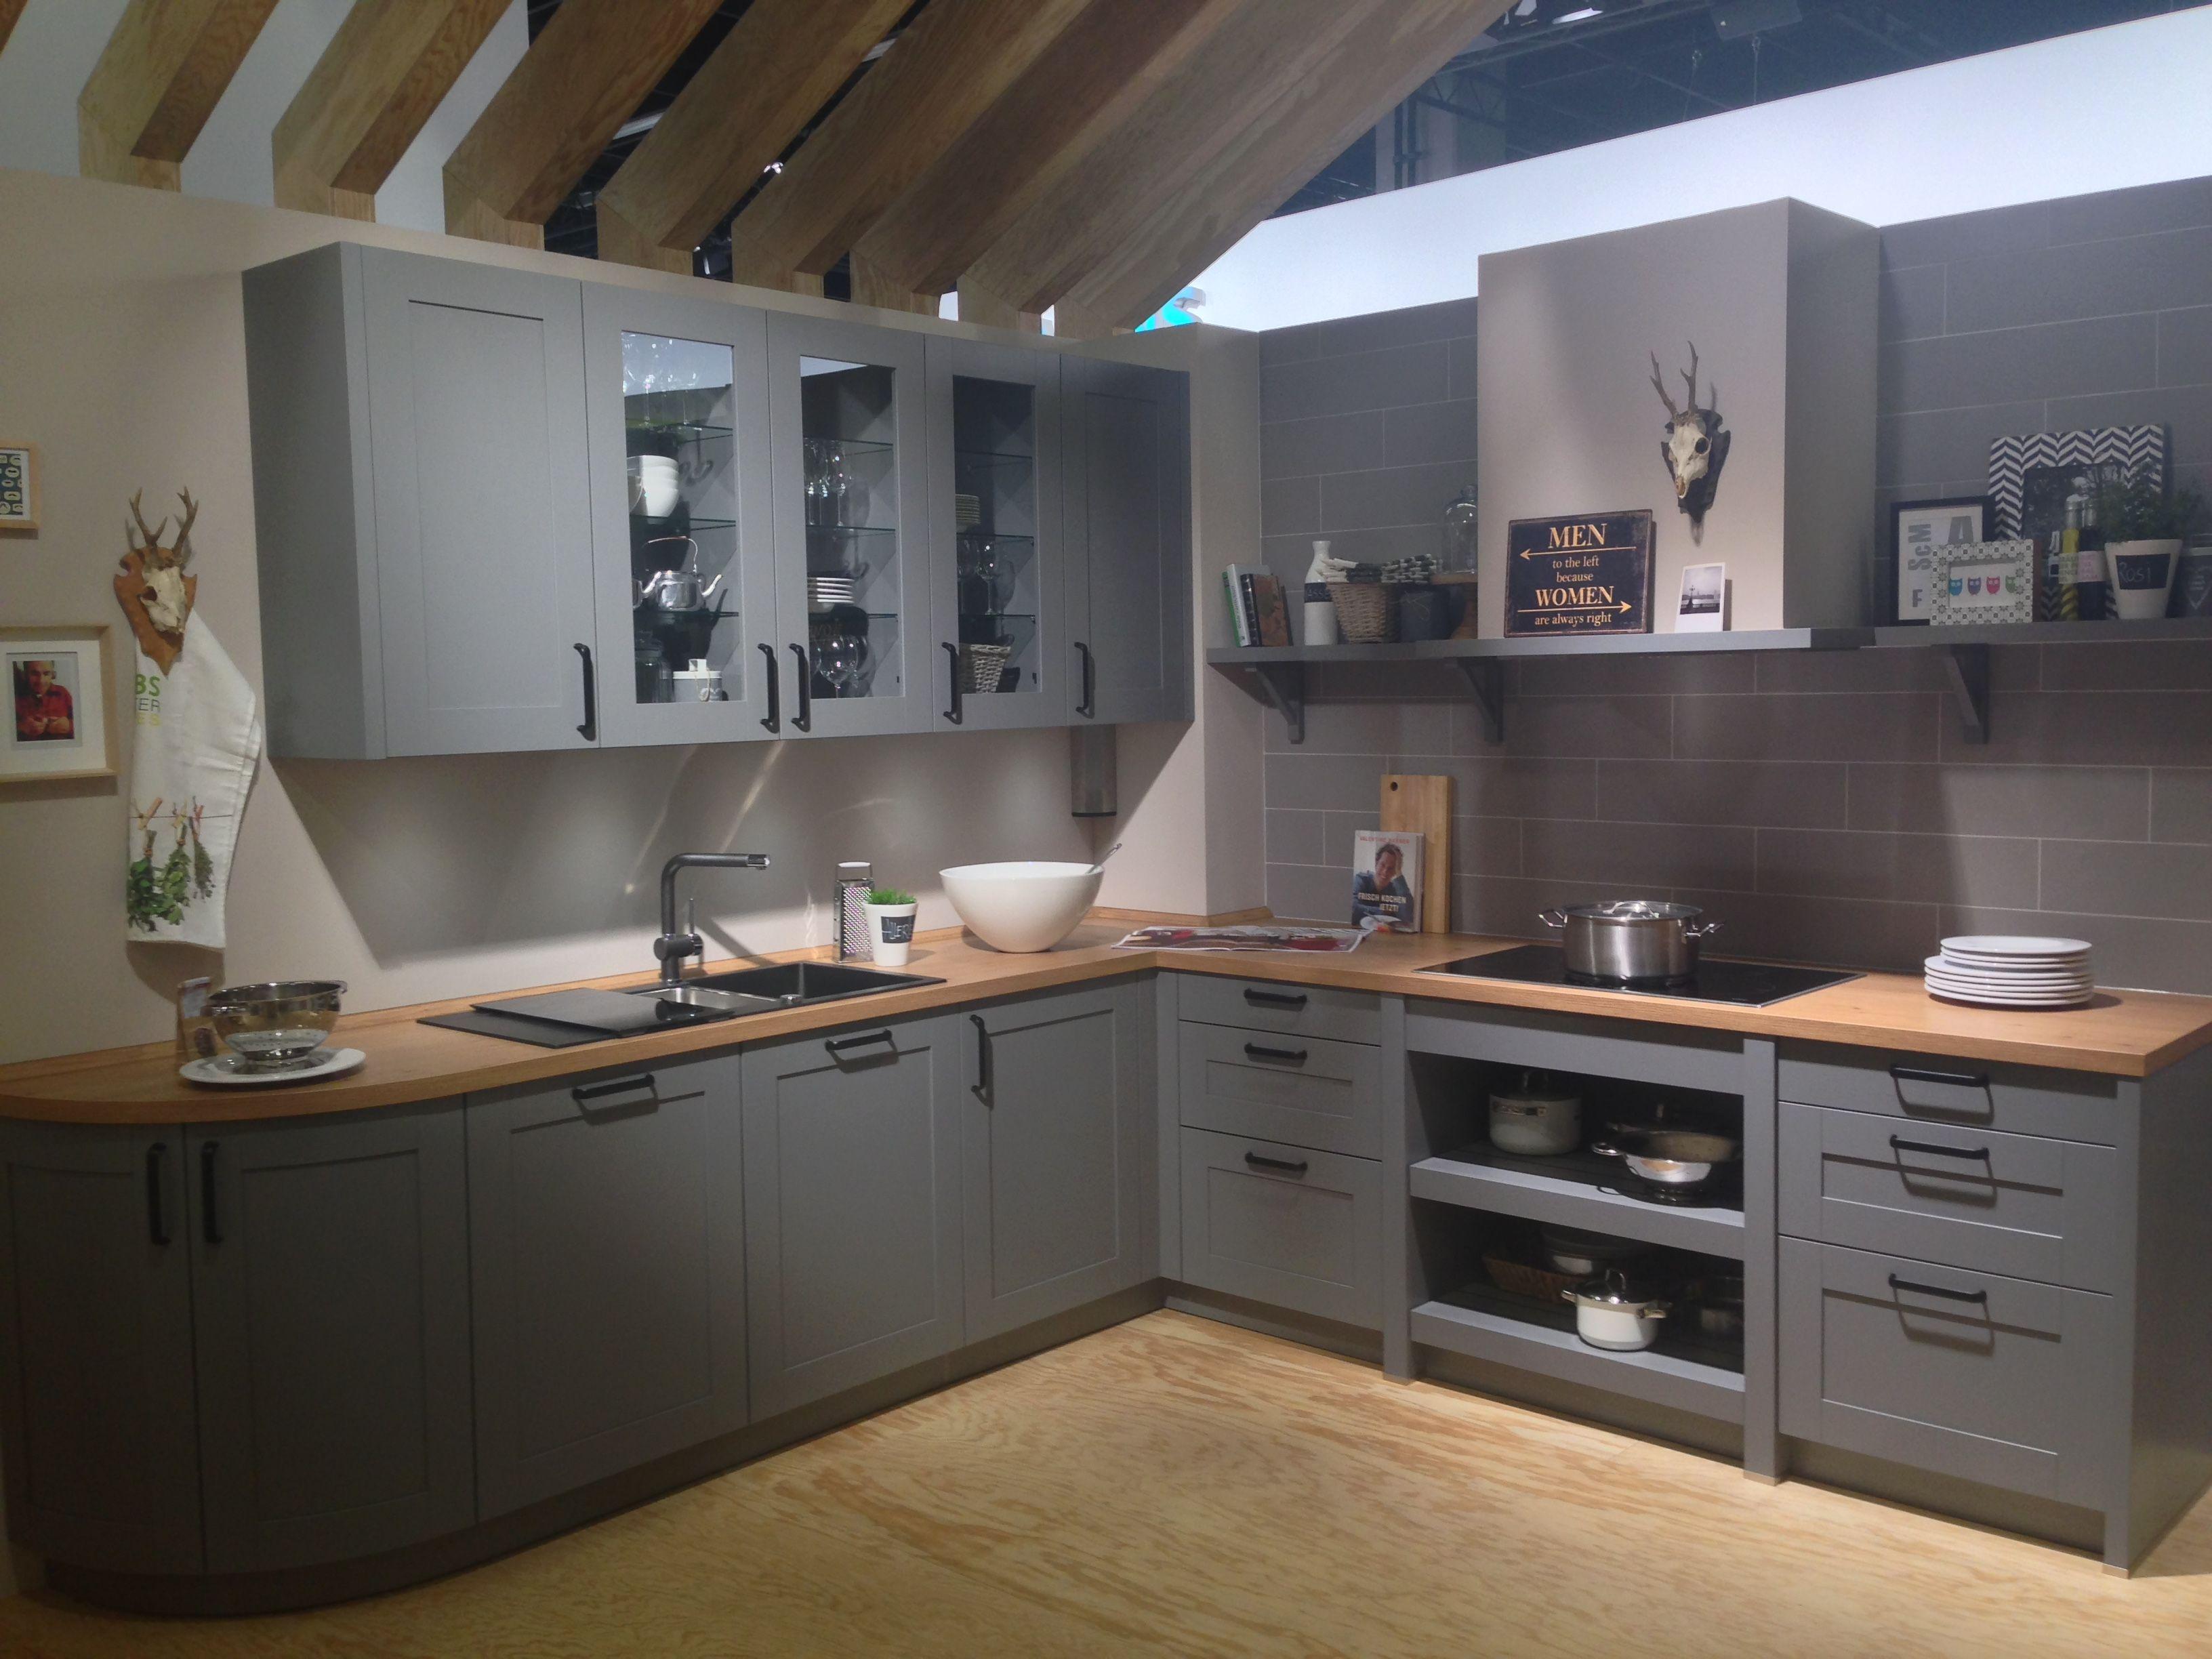 sch ller k chen living kitchen 2015 pinterest sch ller k chen sch ller und k che. Black Bedroom Furniture Sets. Home Design Ideas